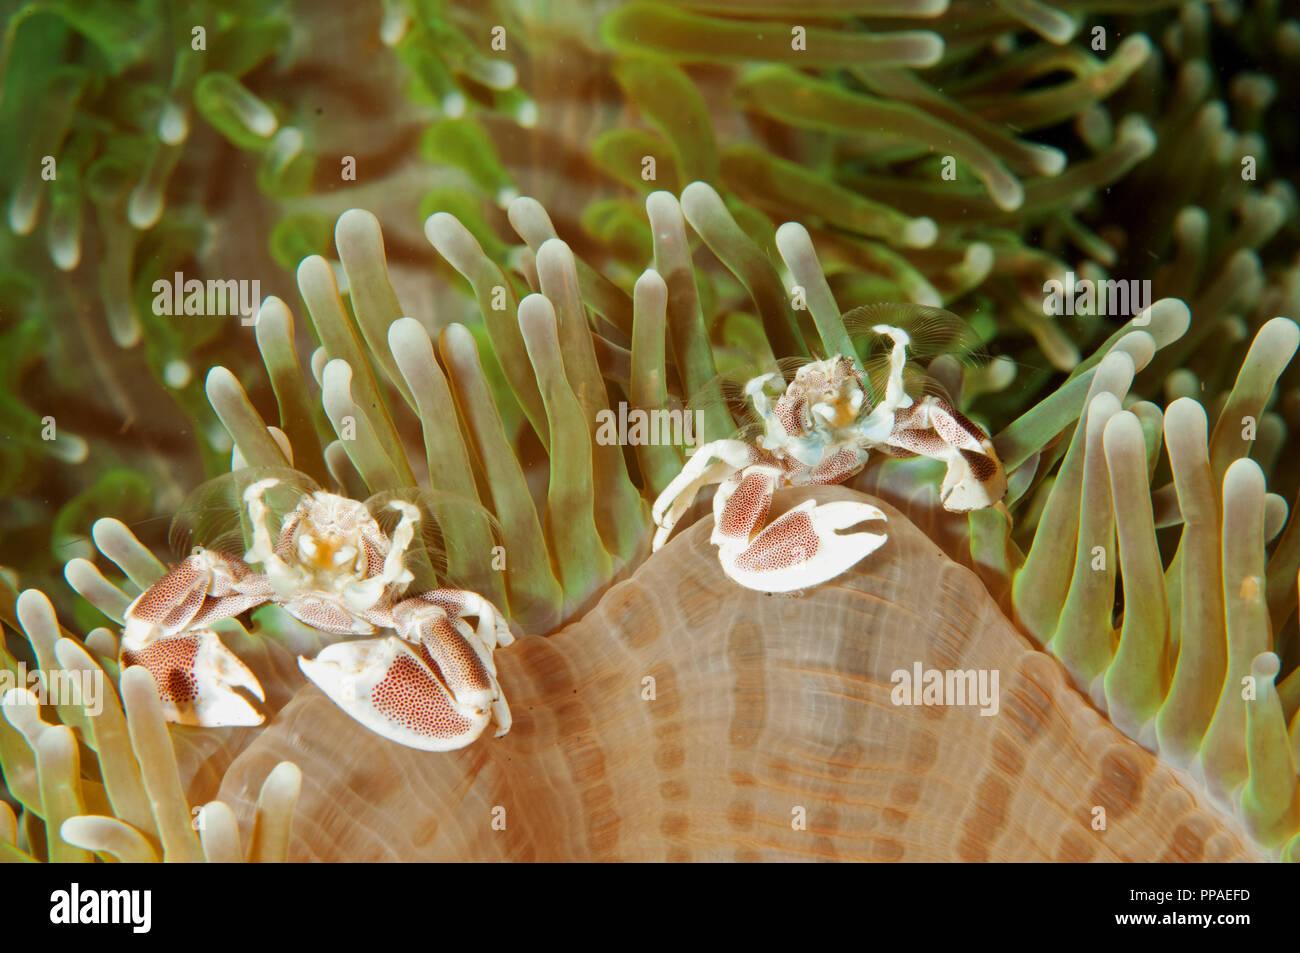 Porcelain crabs, Neopetrolisthes maculatus, Bali Indonesia.. - Stock Image